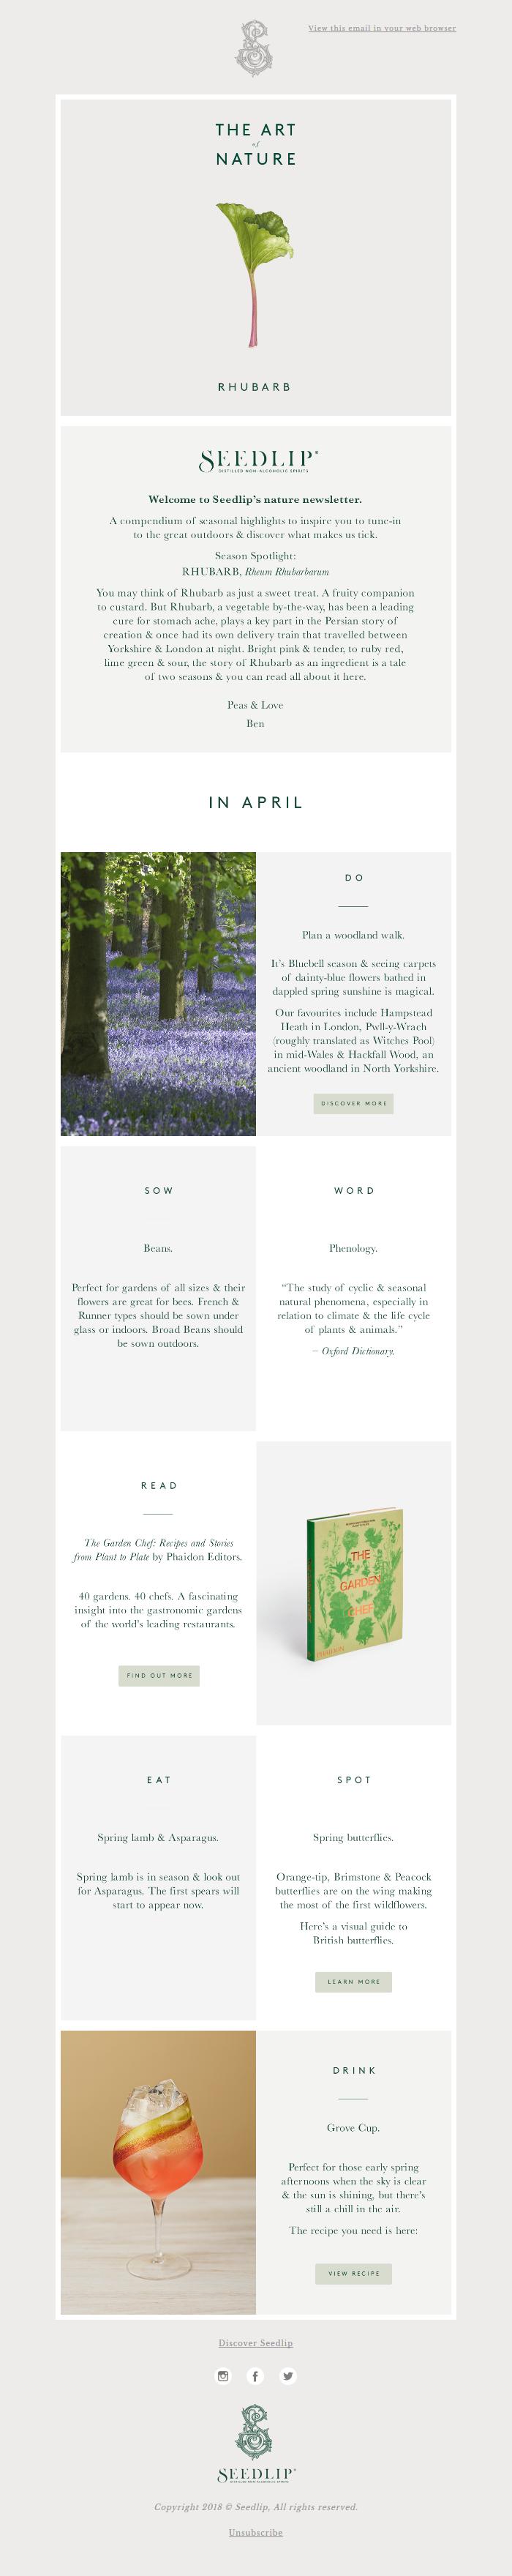 Rhubarb: a tale of two seasons